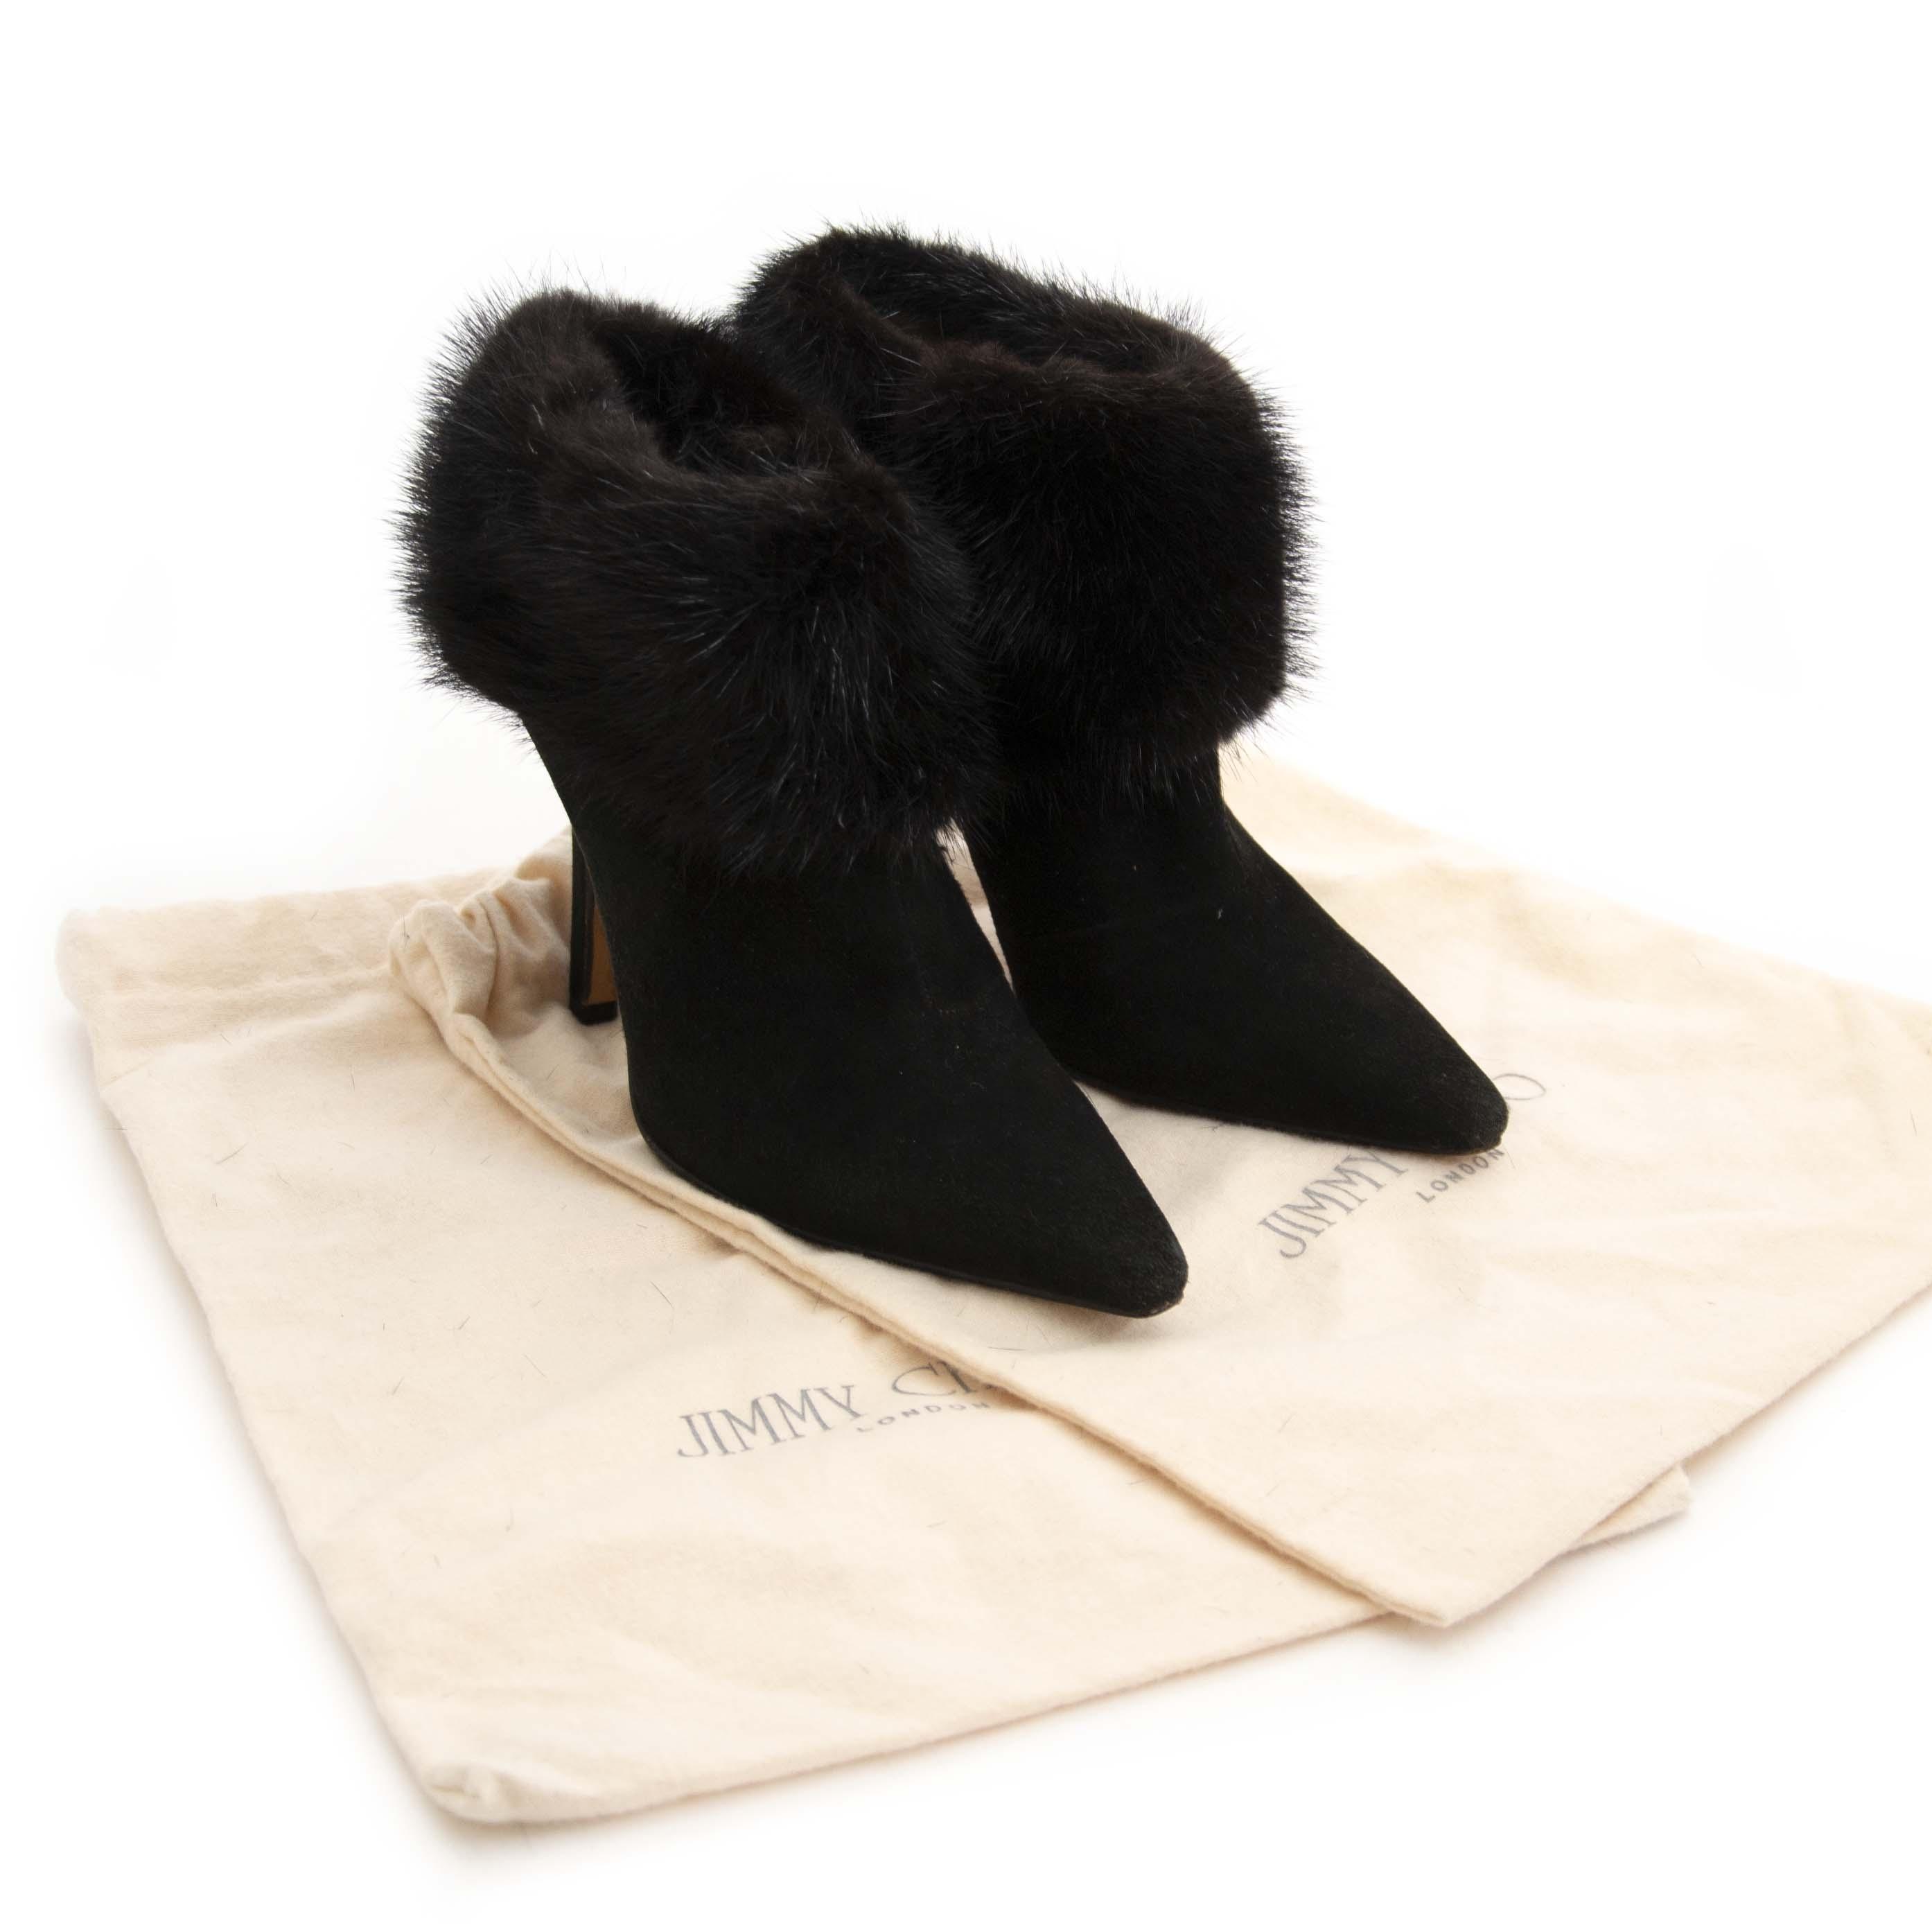 Jimmy Choo Black Pointed-Toe Fur Ankle Boots - Size 36,5. Now for sale at labellov.com for the best price. Op zoek naar Jimmy Choo ankle boots? Nu te koop bij labellov.com tegen de beste prijs.